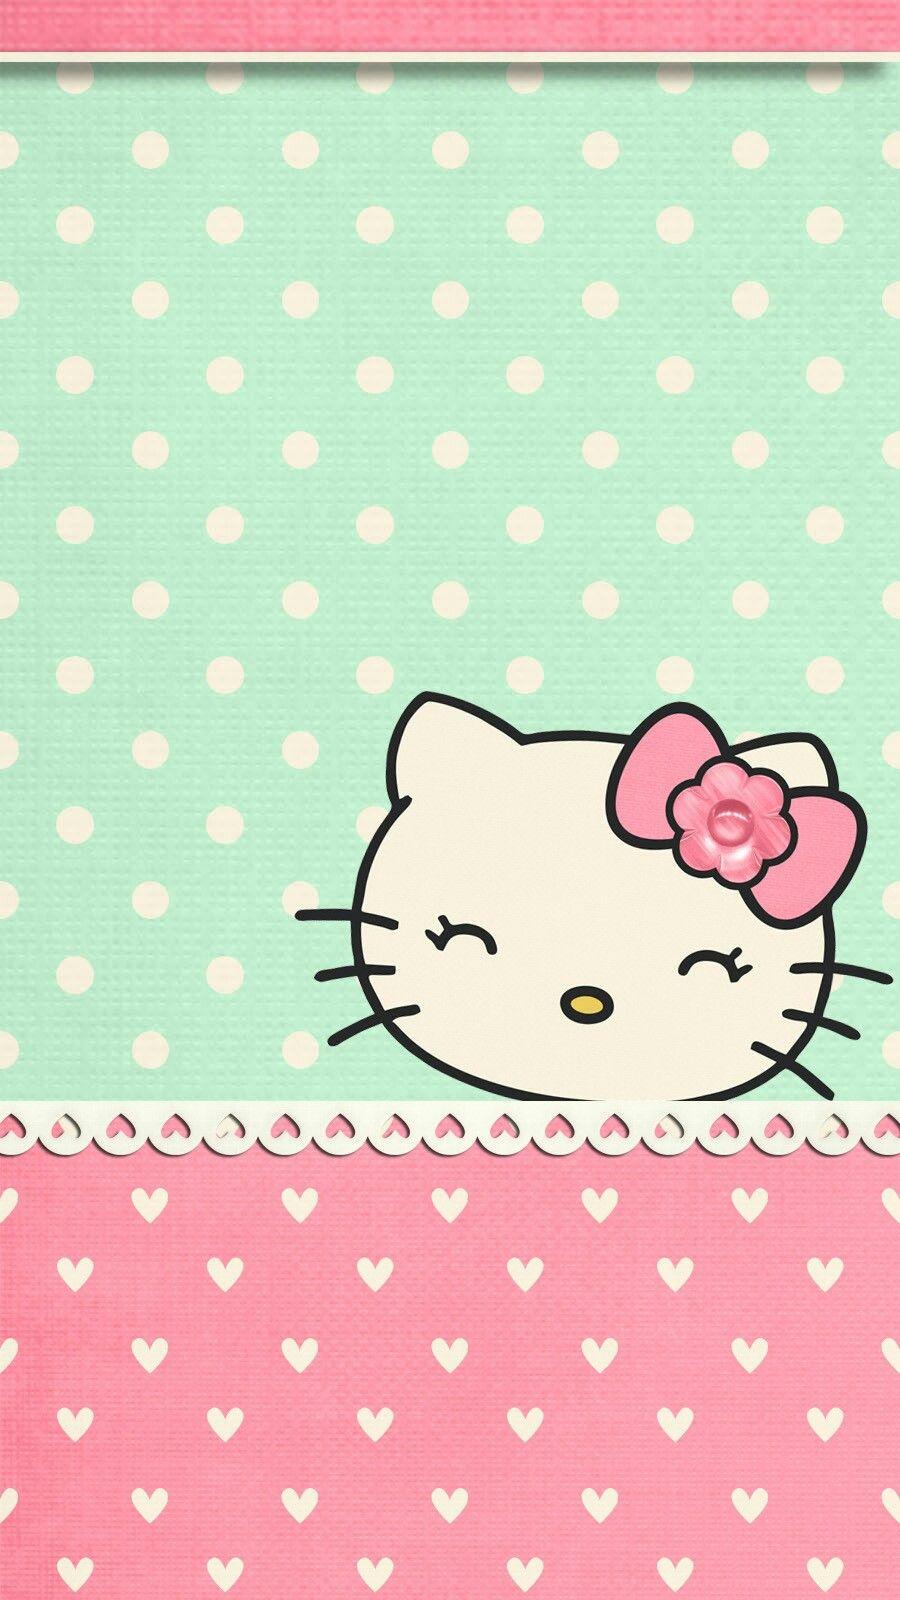 Spring Blossom04 Hello Kitty Wallpaper Hello Kitty Wallpaper Hd Hello Kitty Backgrounds